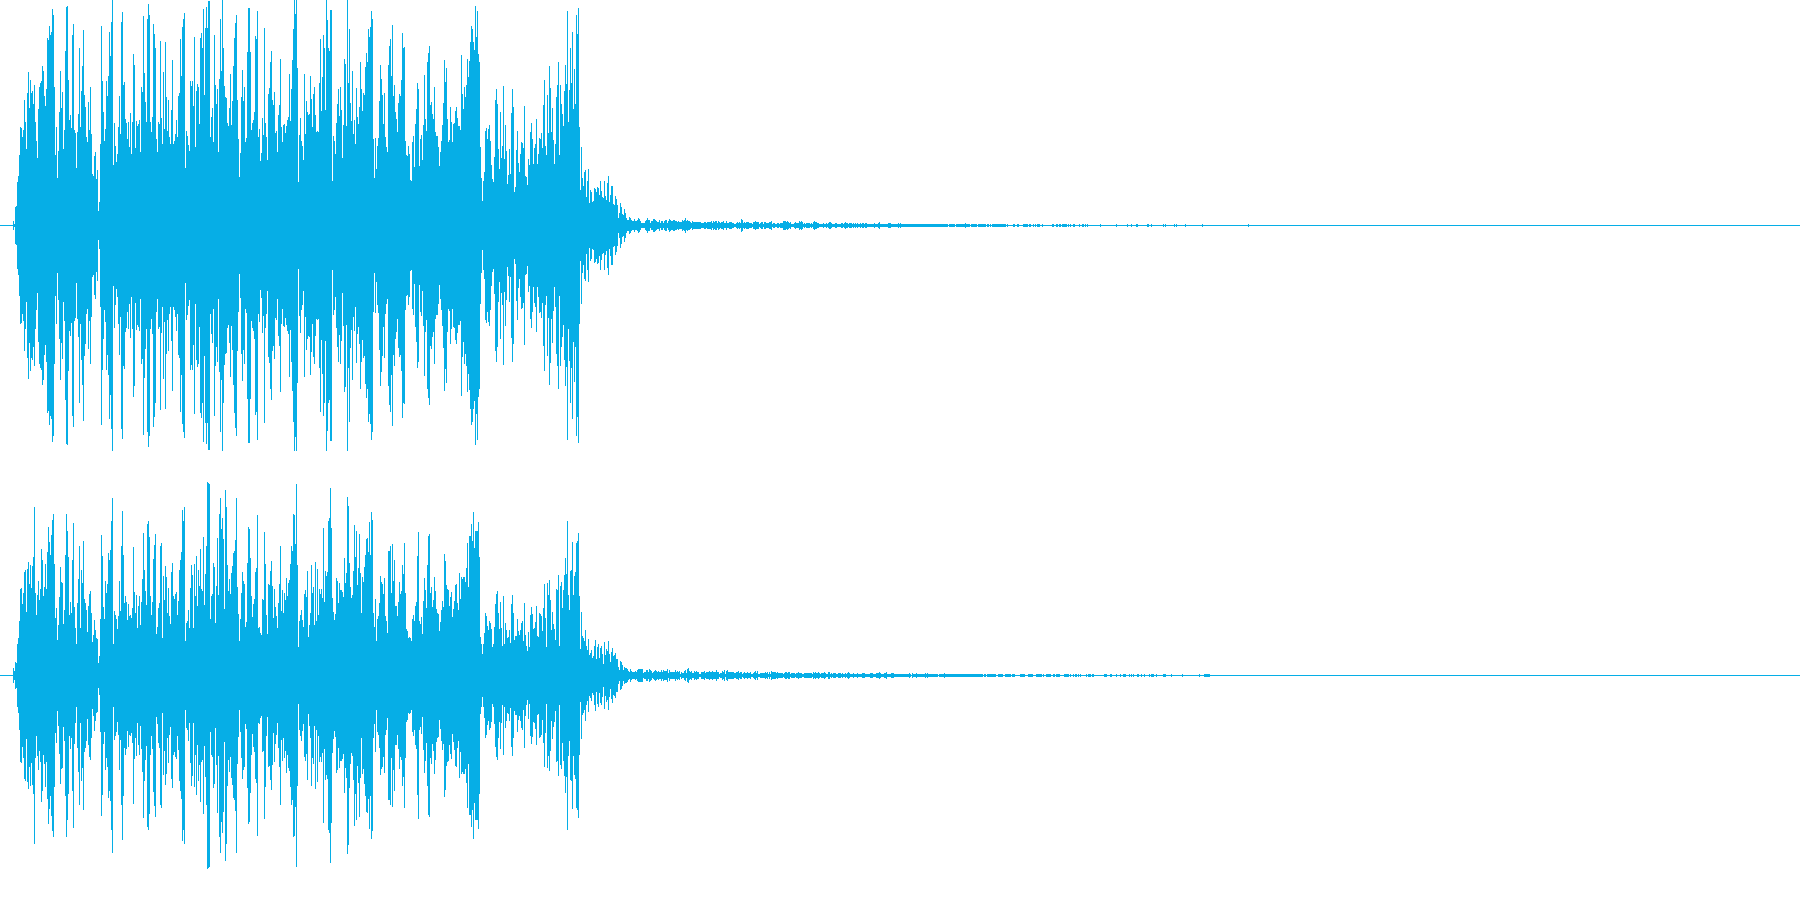 DJがレコードを素早く巻き戻した音の再生済みの波形